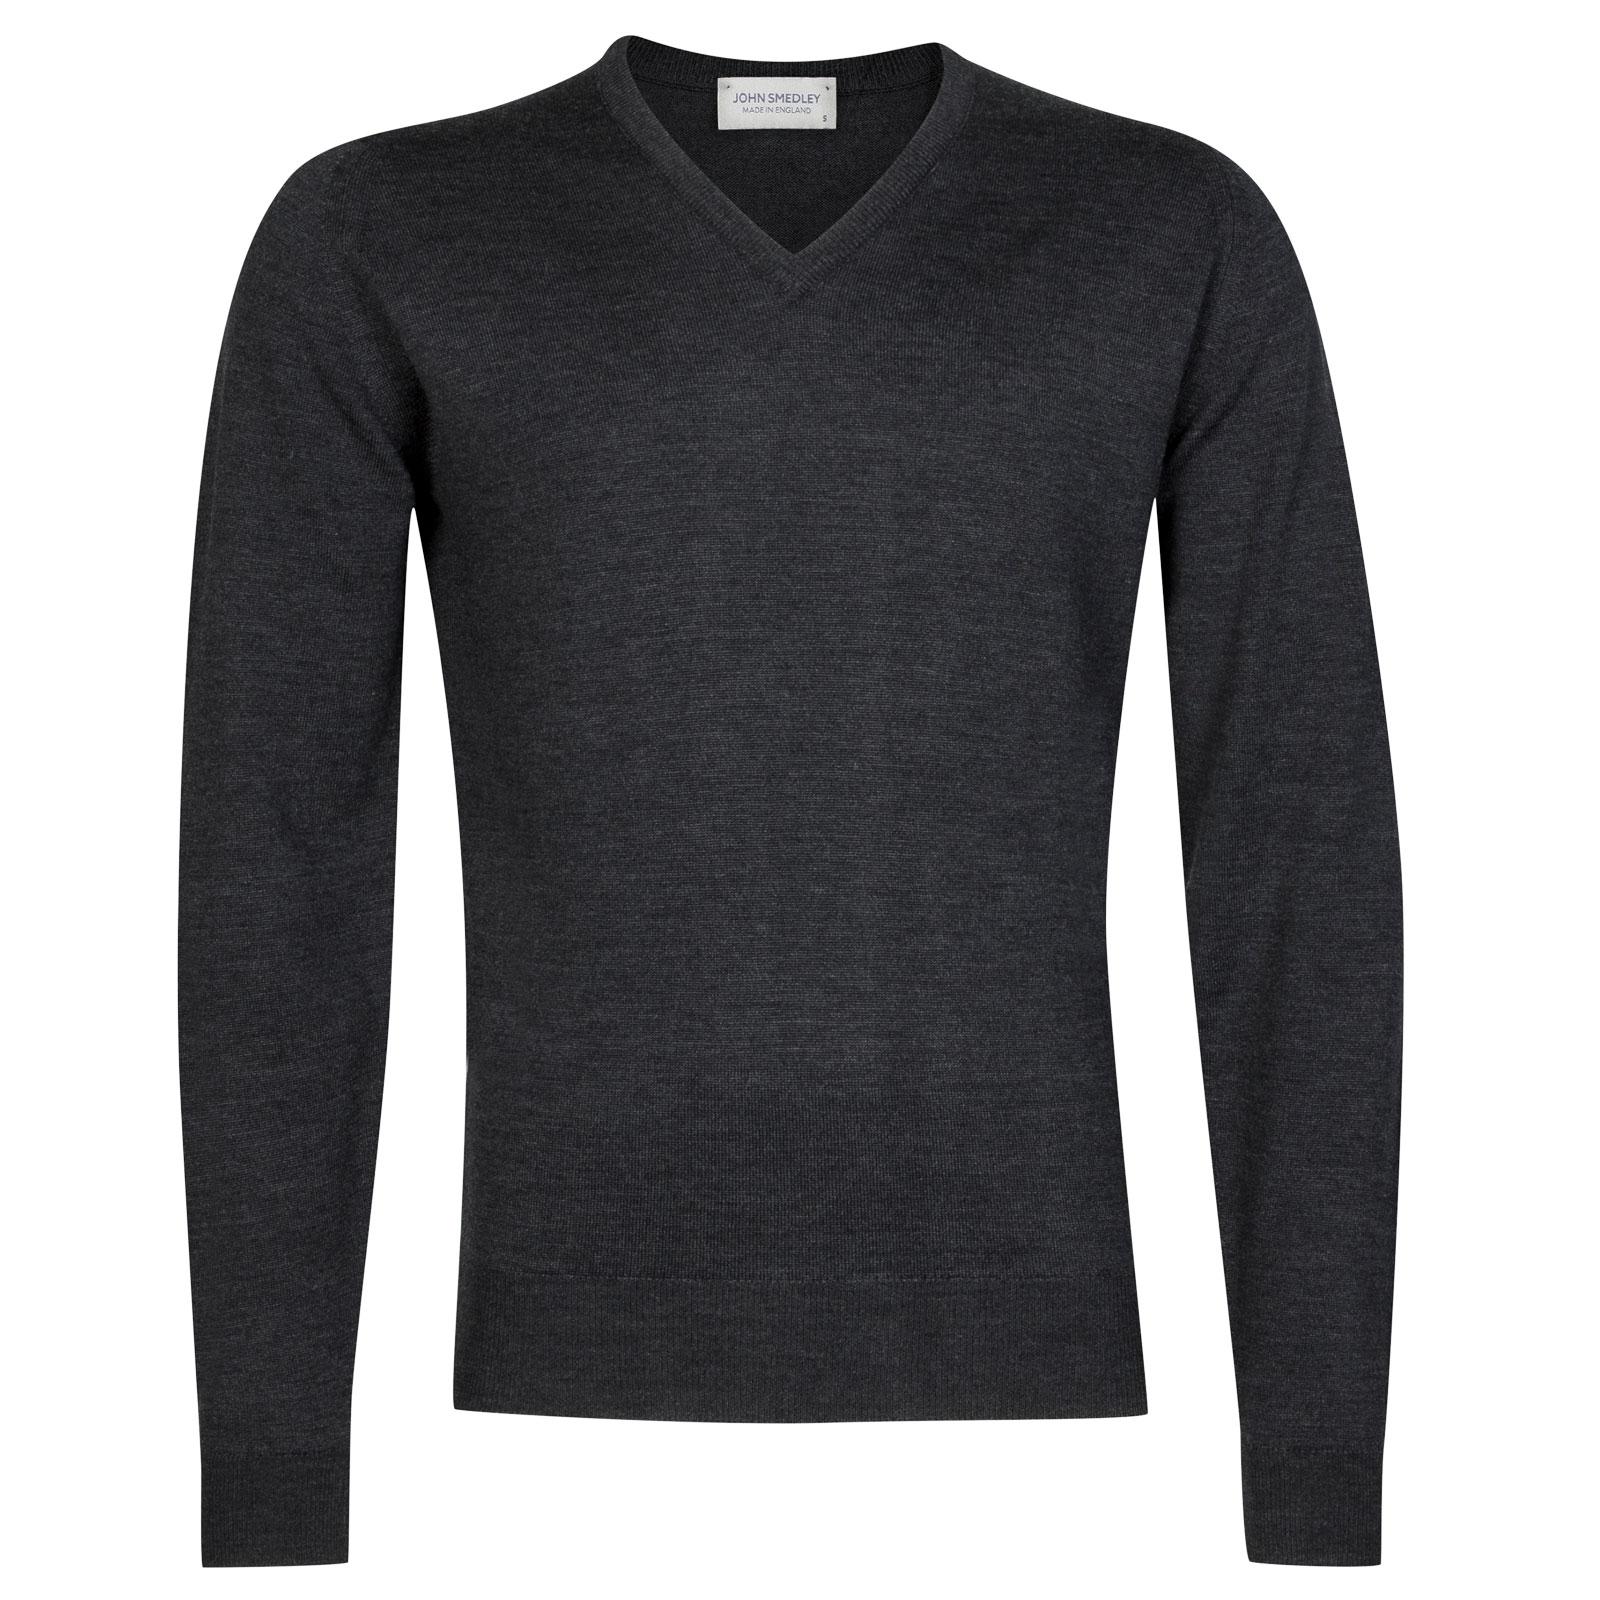 John Smedley Riber Merino Wool Pullover in Charcoal-XXL